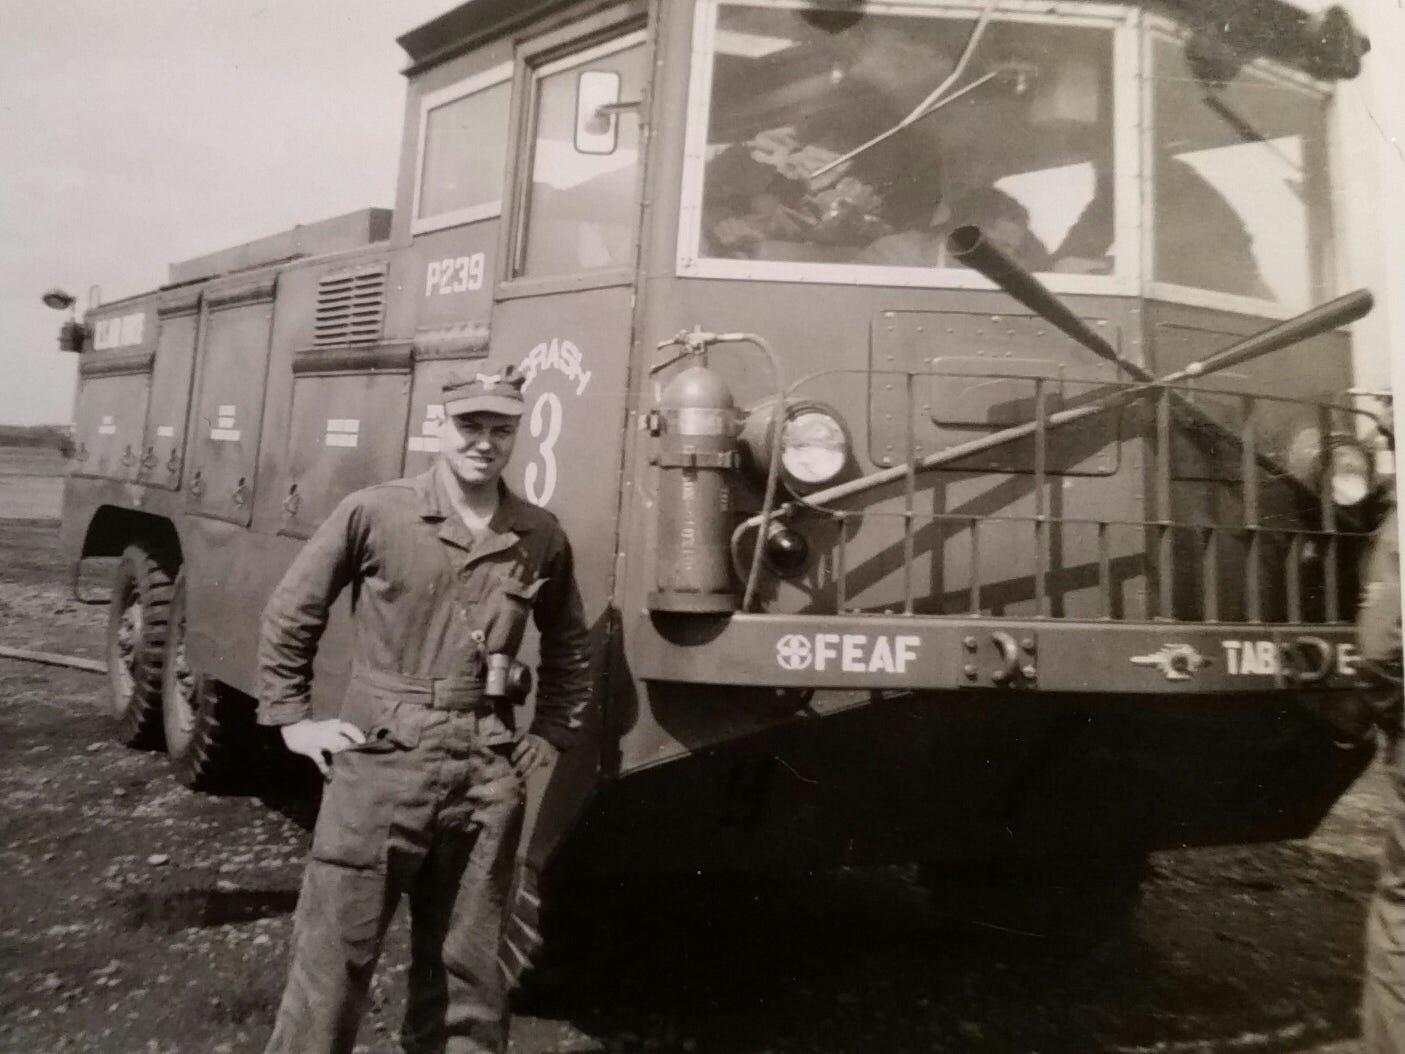 Veteran's Story: Sleeping in a trench to avoid grenade shrapnel